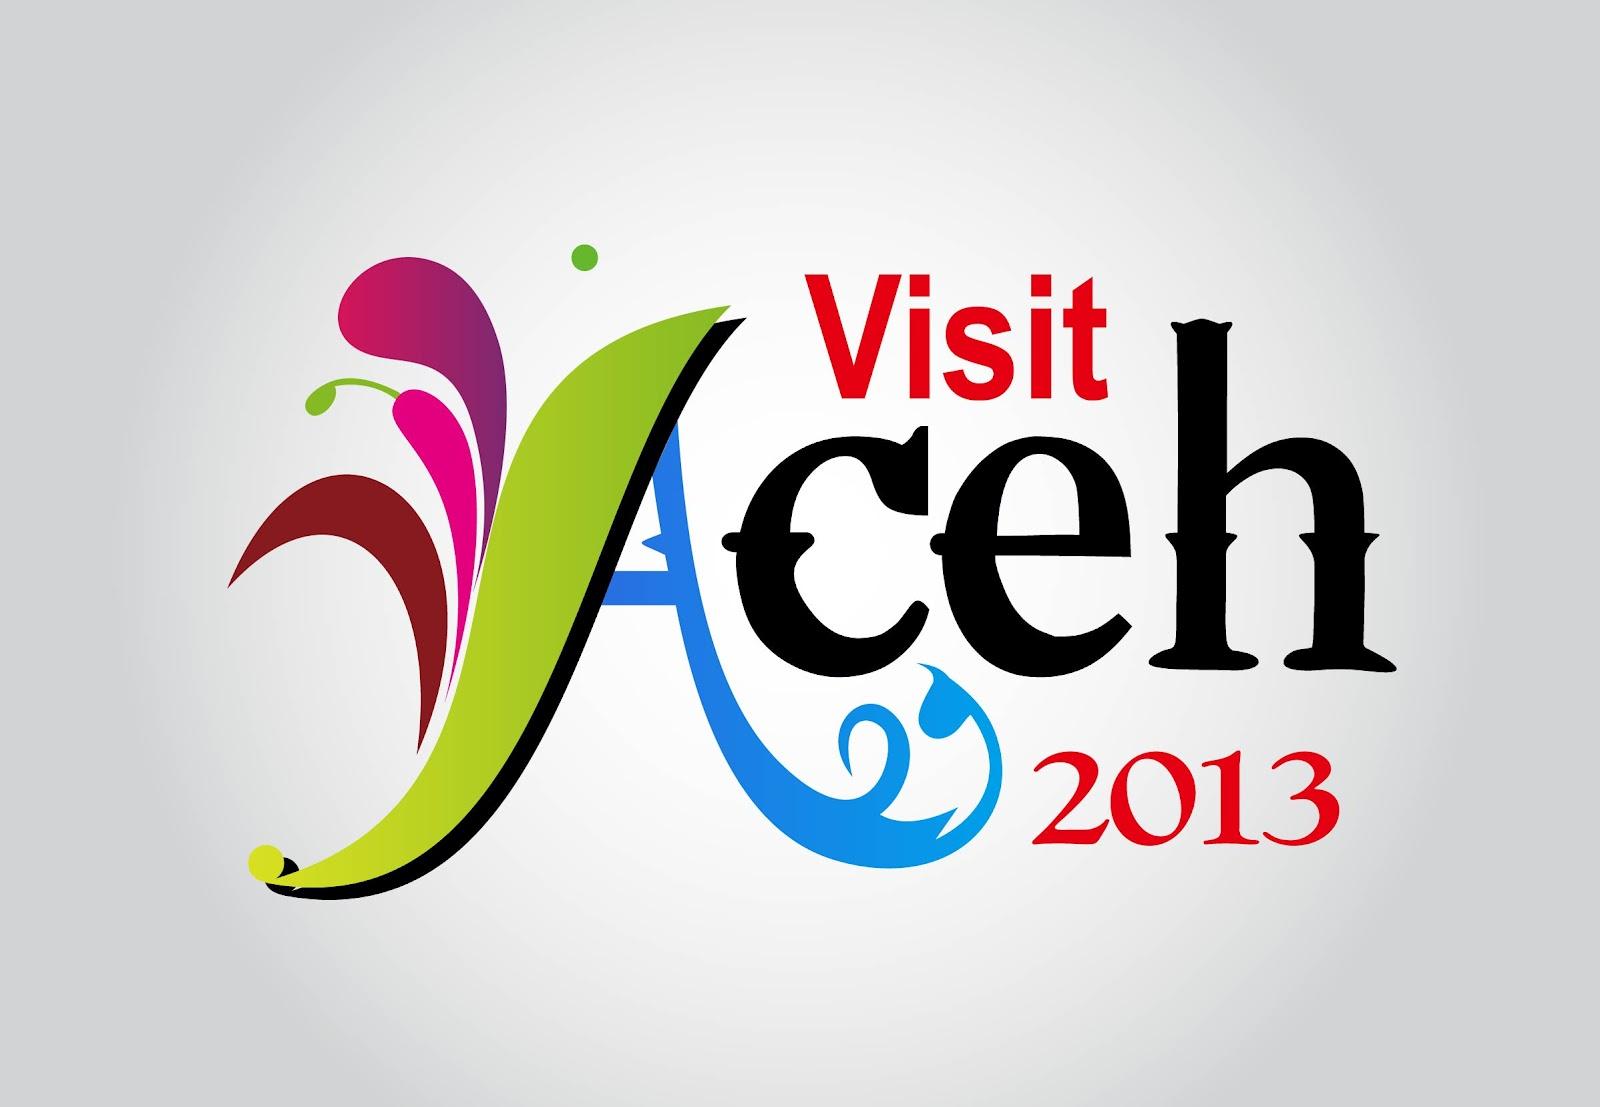 logo-visit-aceh-2013-from-acehdesain.jpg (1600×1107)